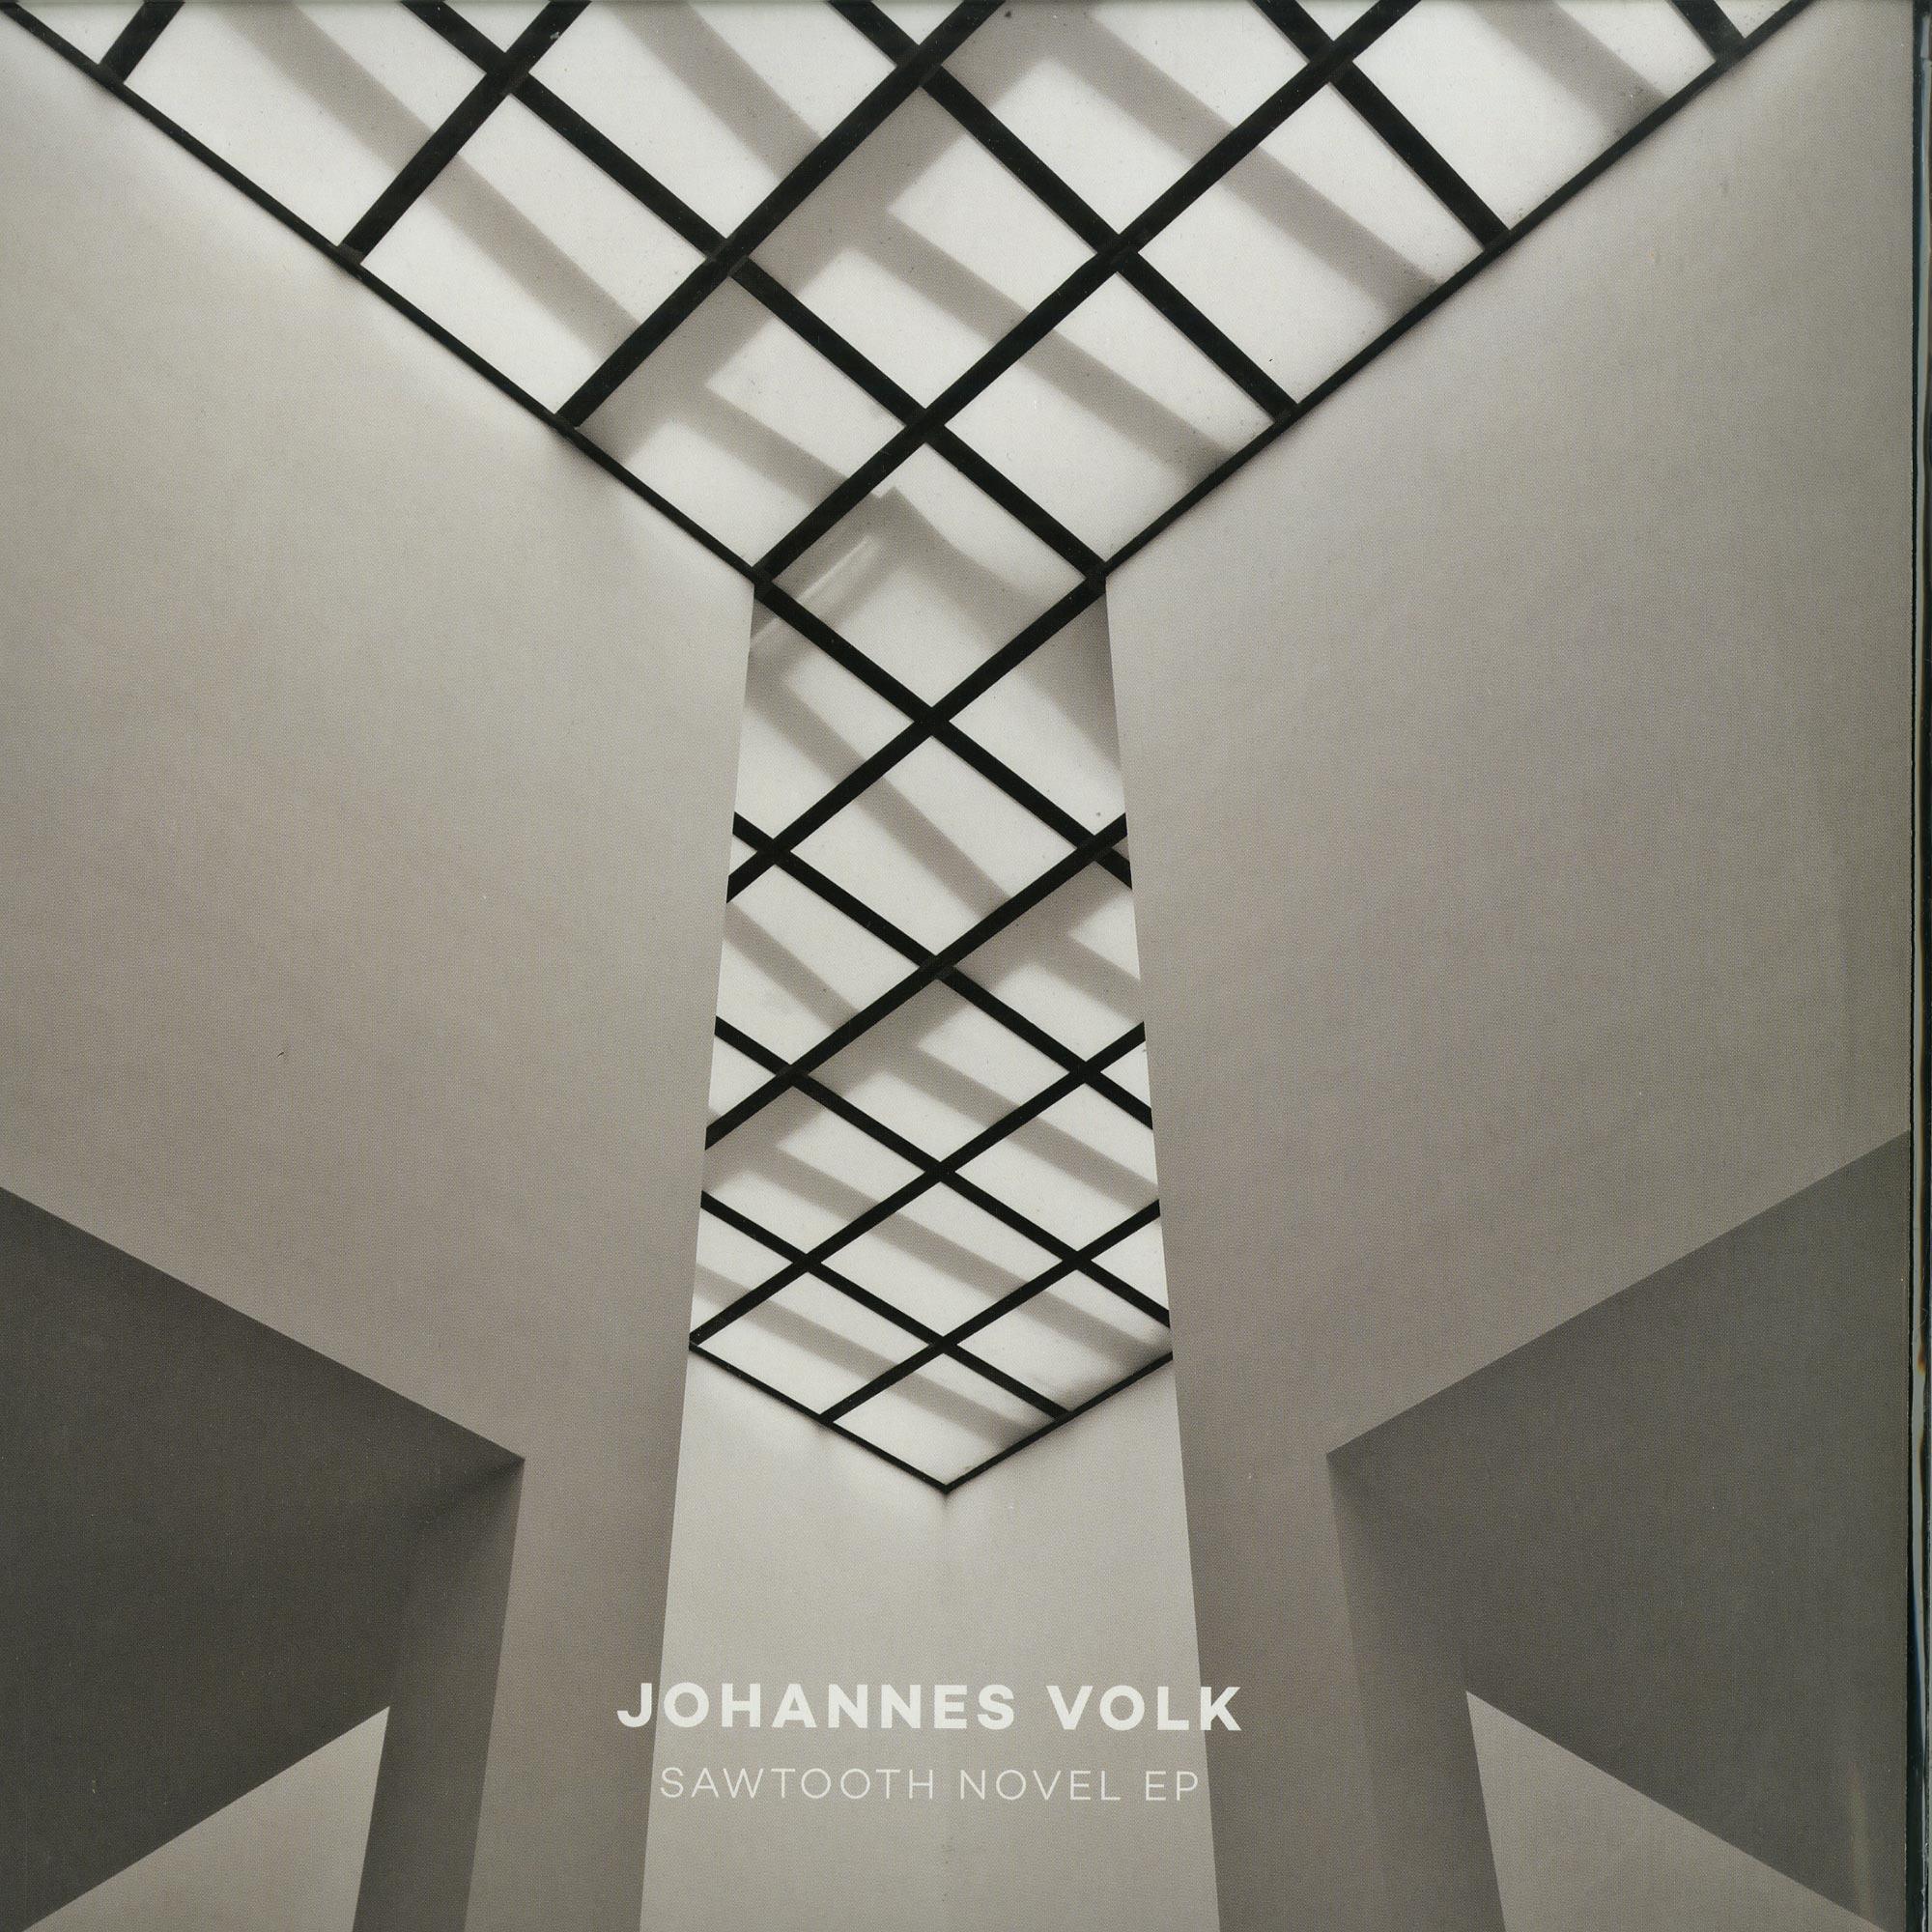 Johannes Volk - SAWTOOTH NOVEL EP